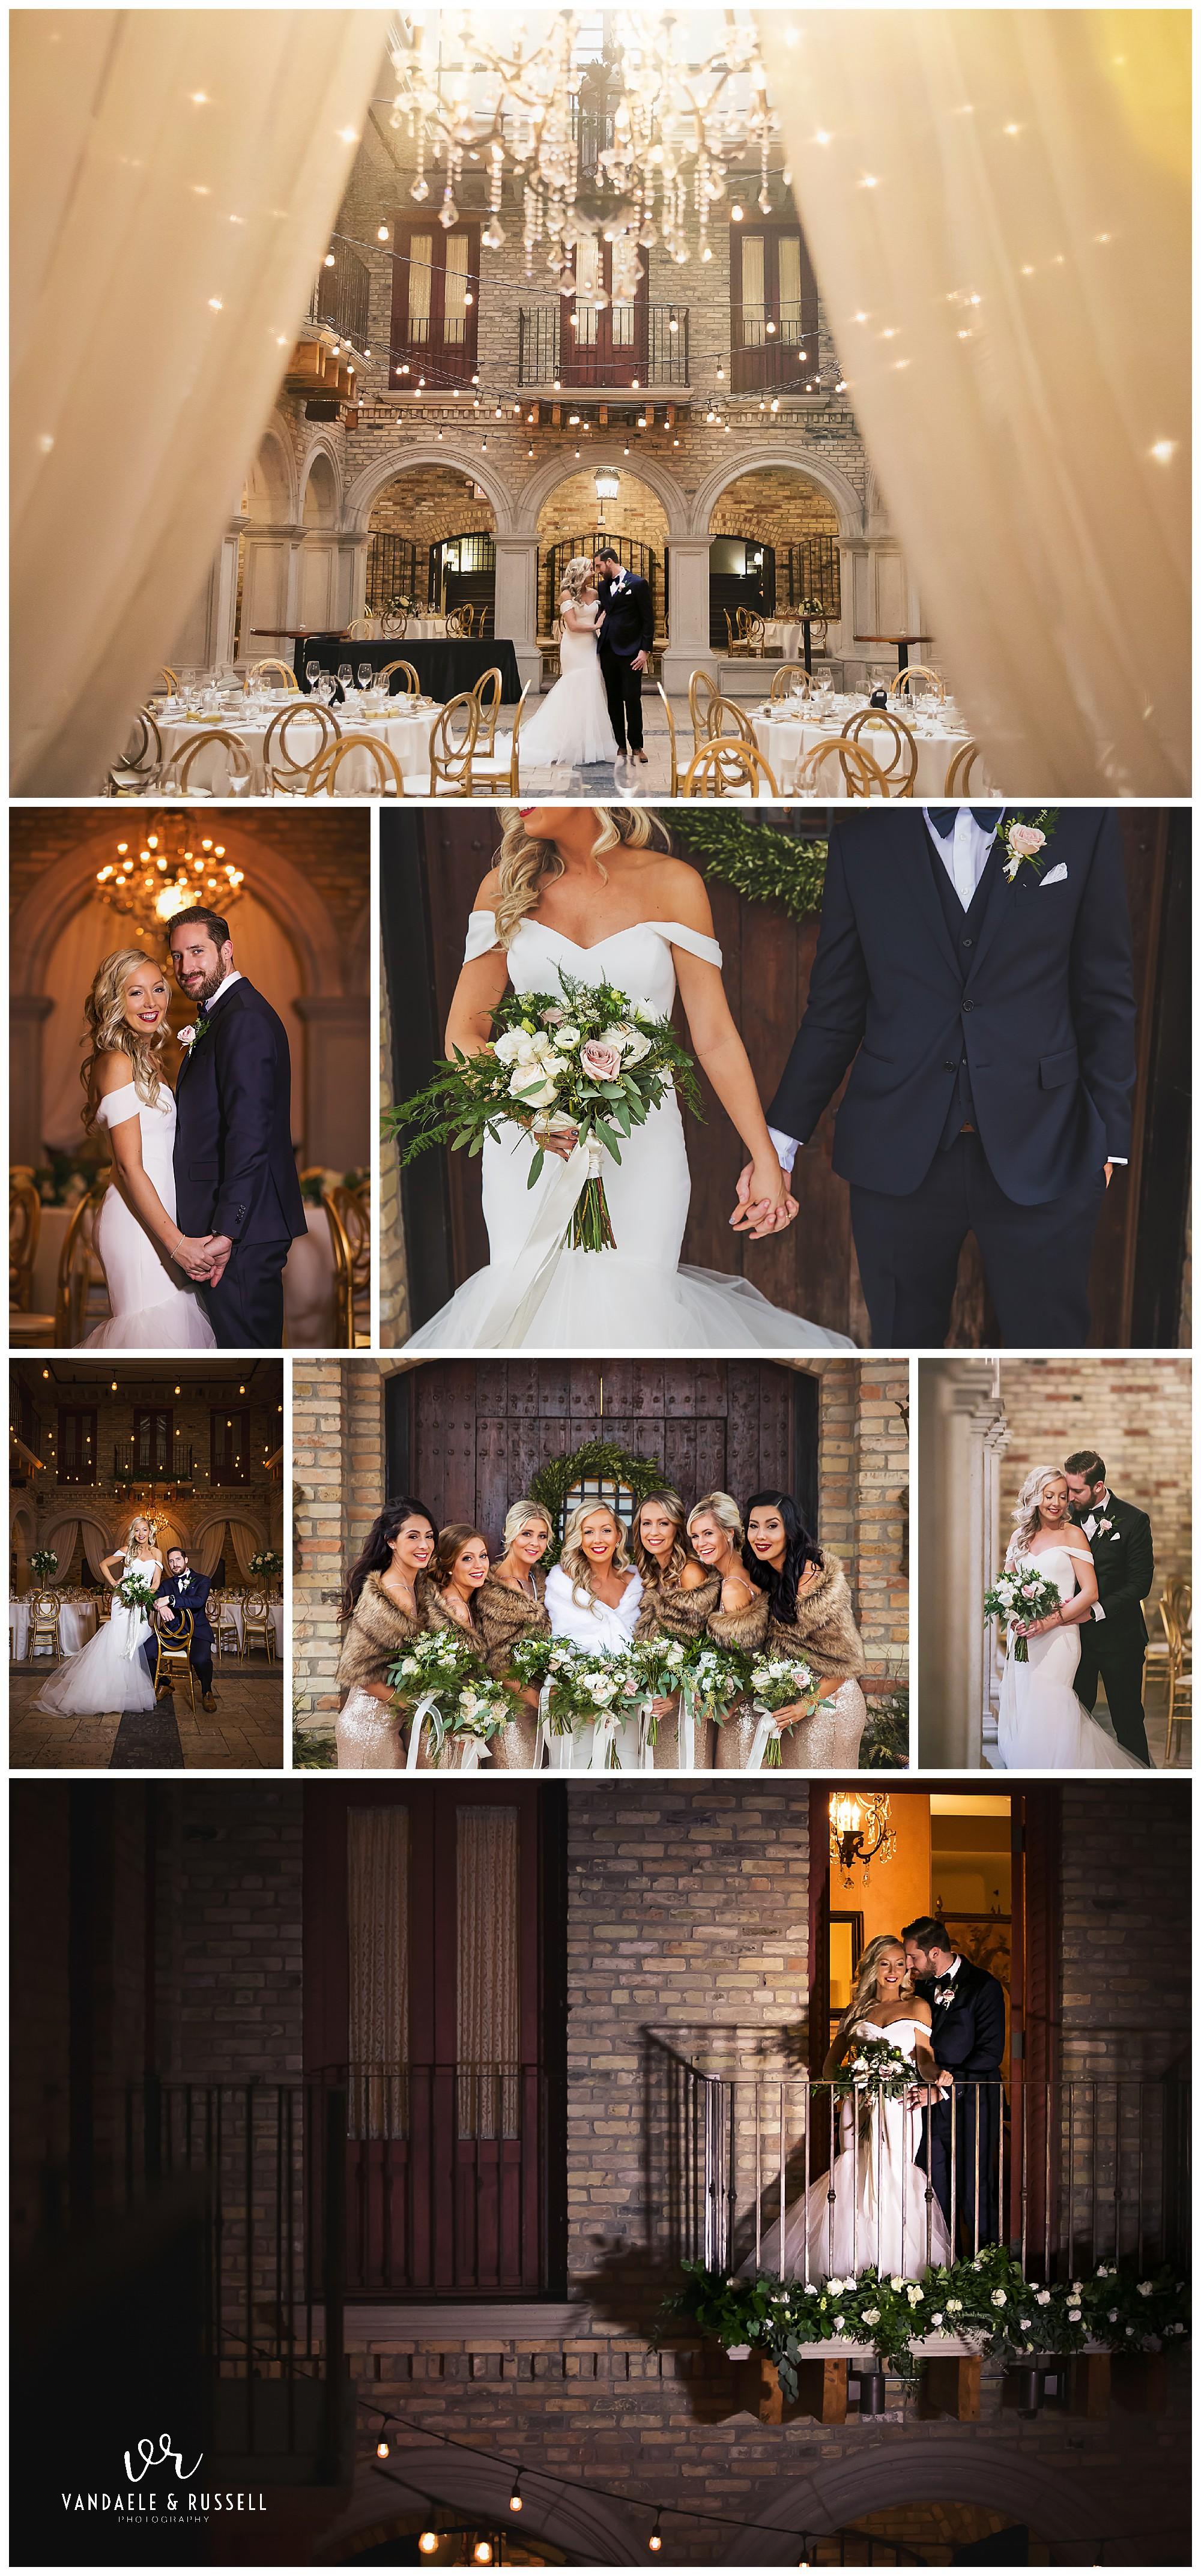 Hacienda-Sarria-Wedding-Photos-NYE-Michelle-Matt-VanDaele-Russell_0010.jpg